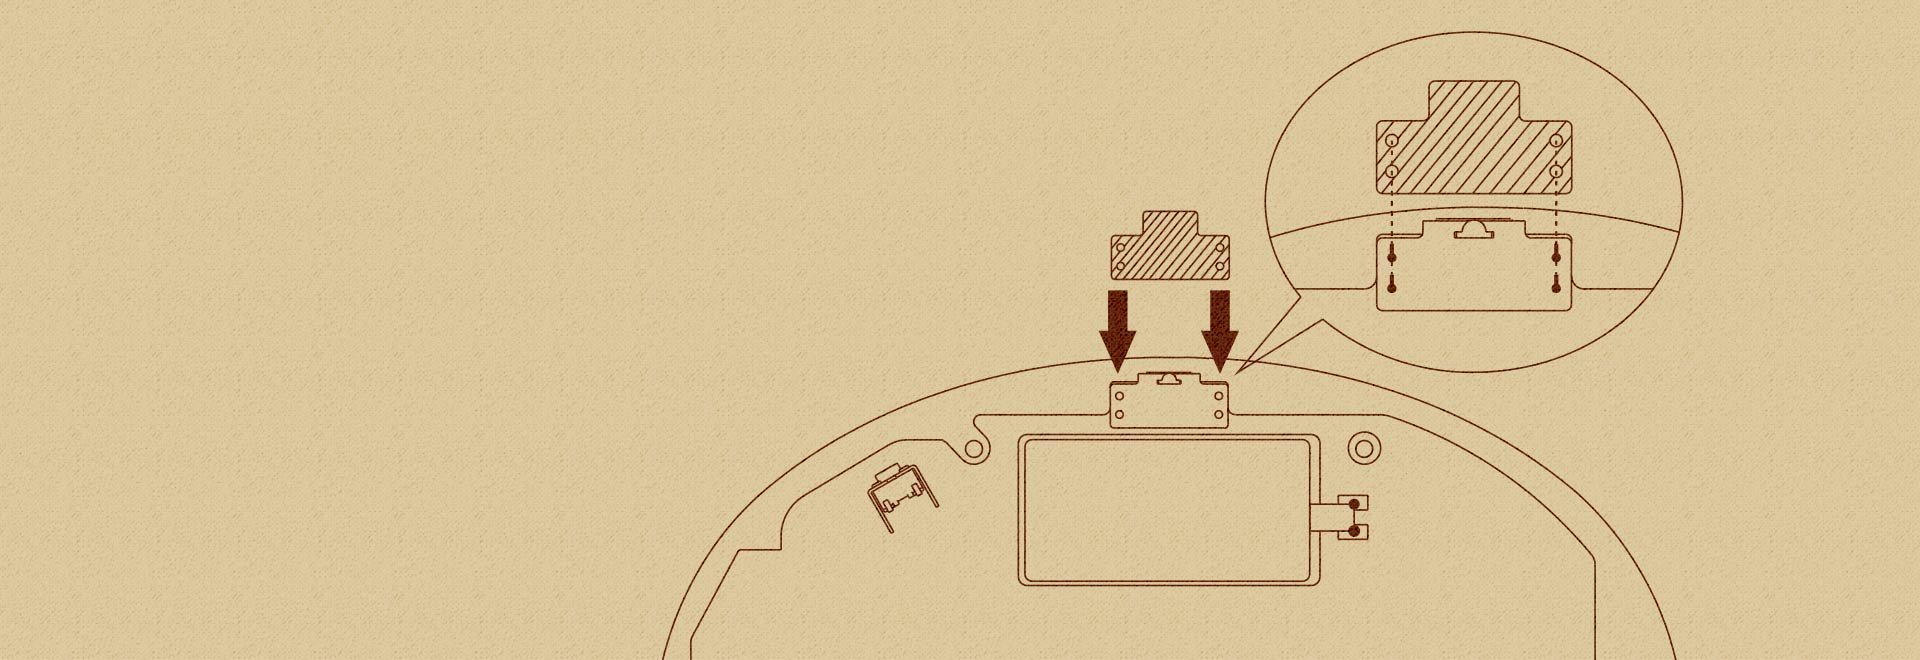 8bitdo Mod Kit For Original Sega Mega Drive Controller Modded Wiring Diagram Md